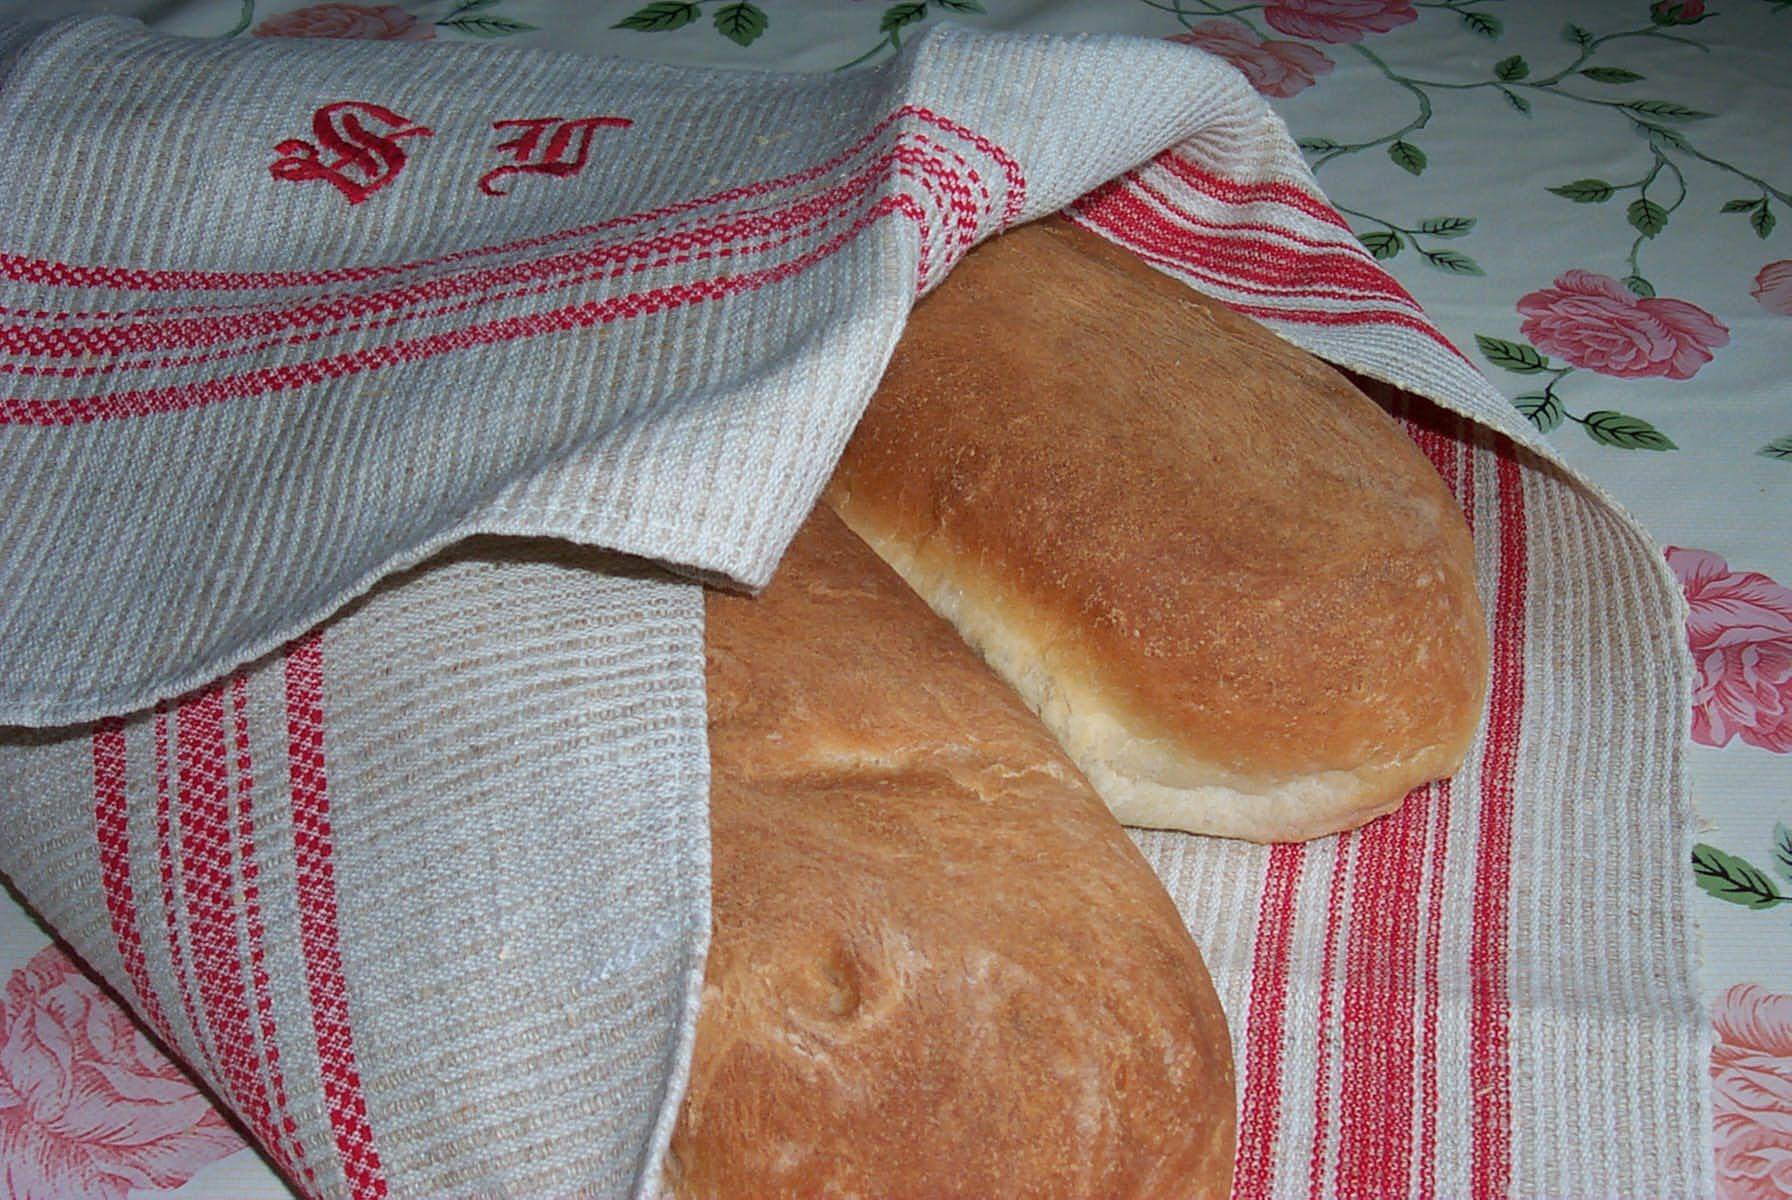 Mitt goda hembakta bröd